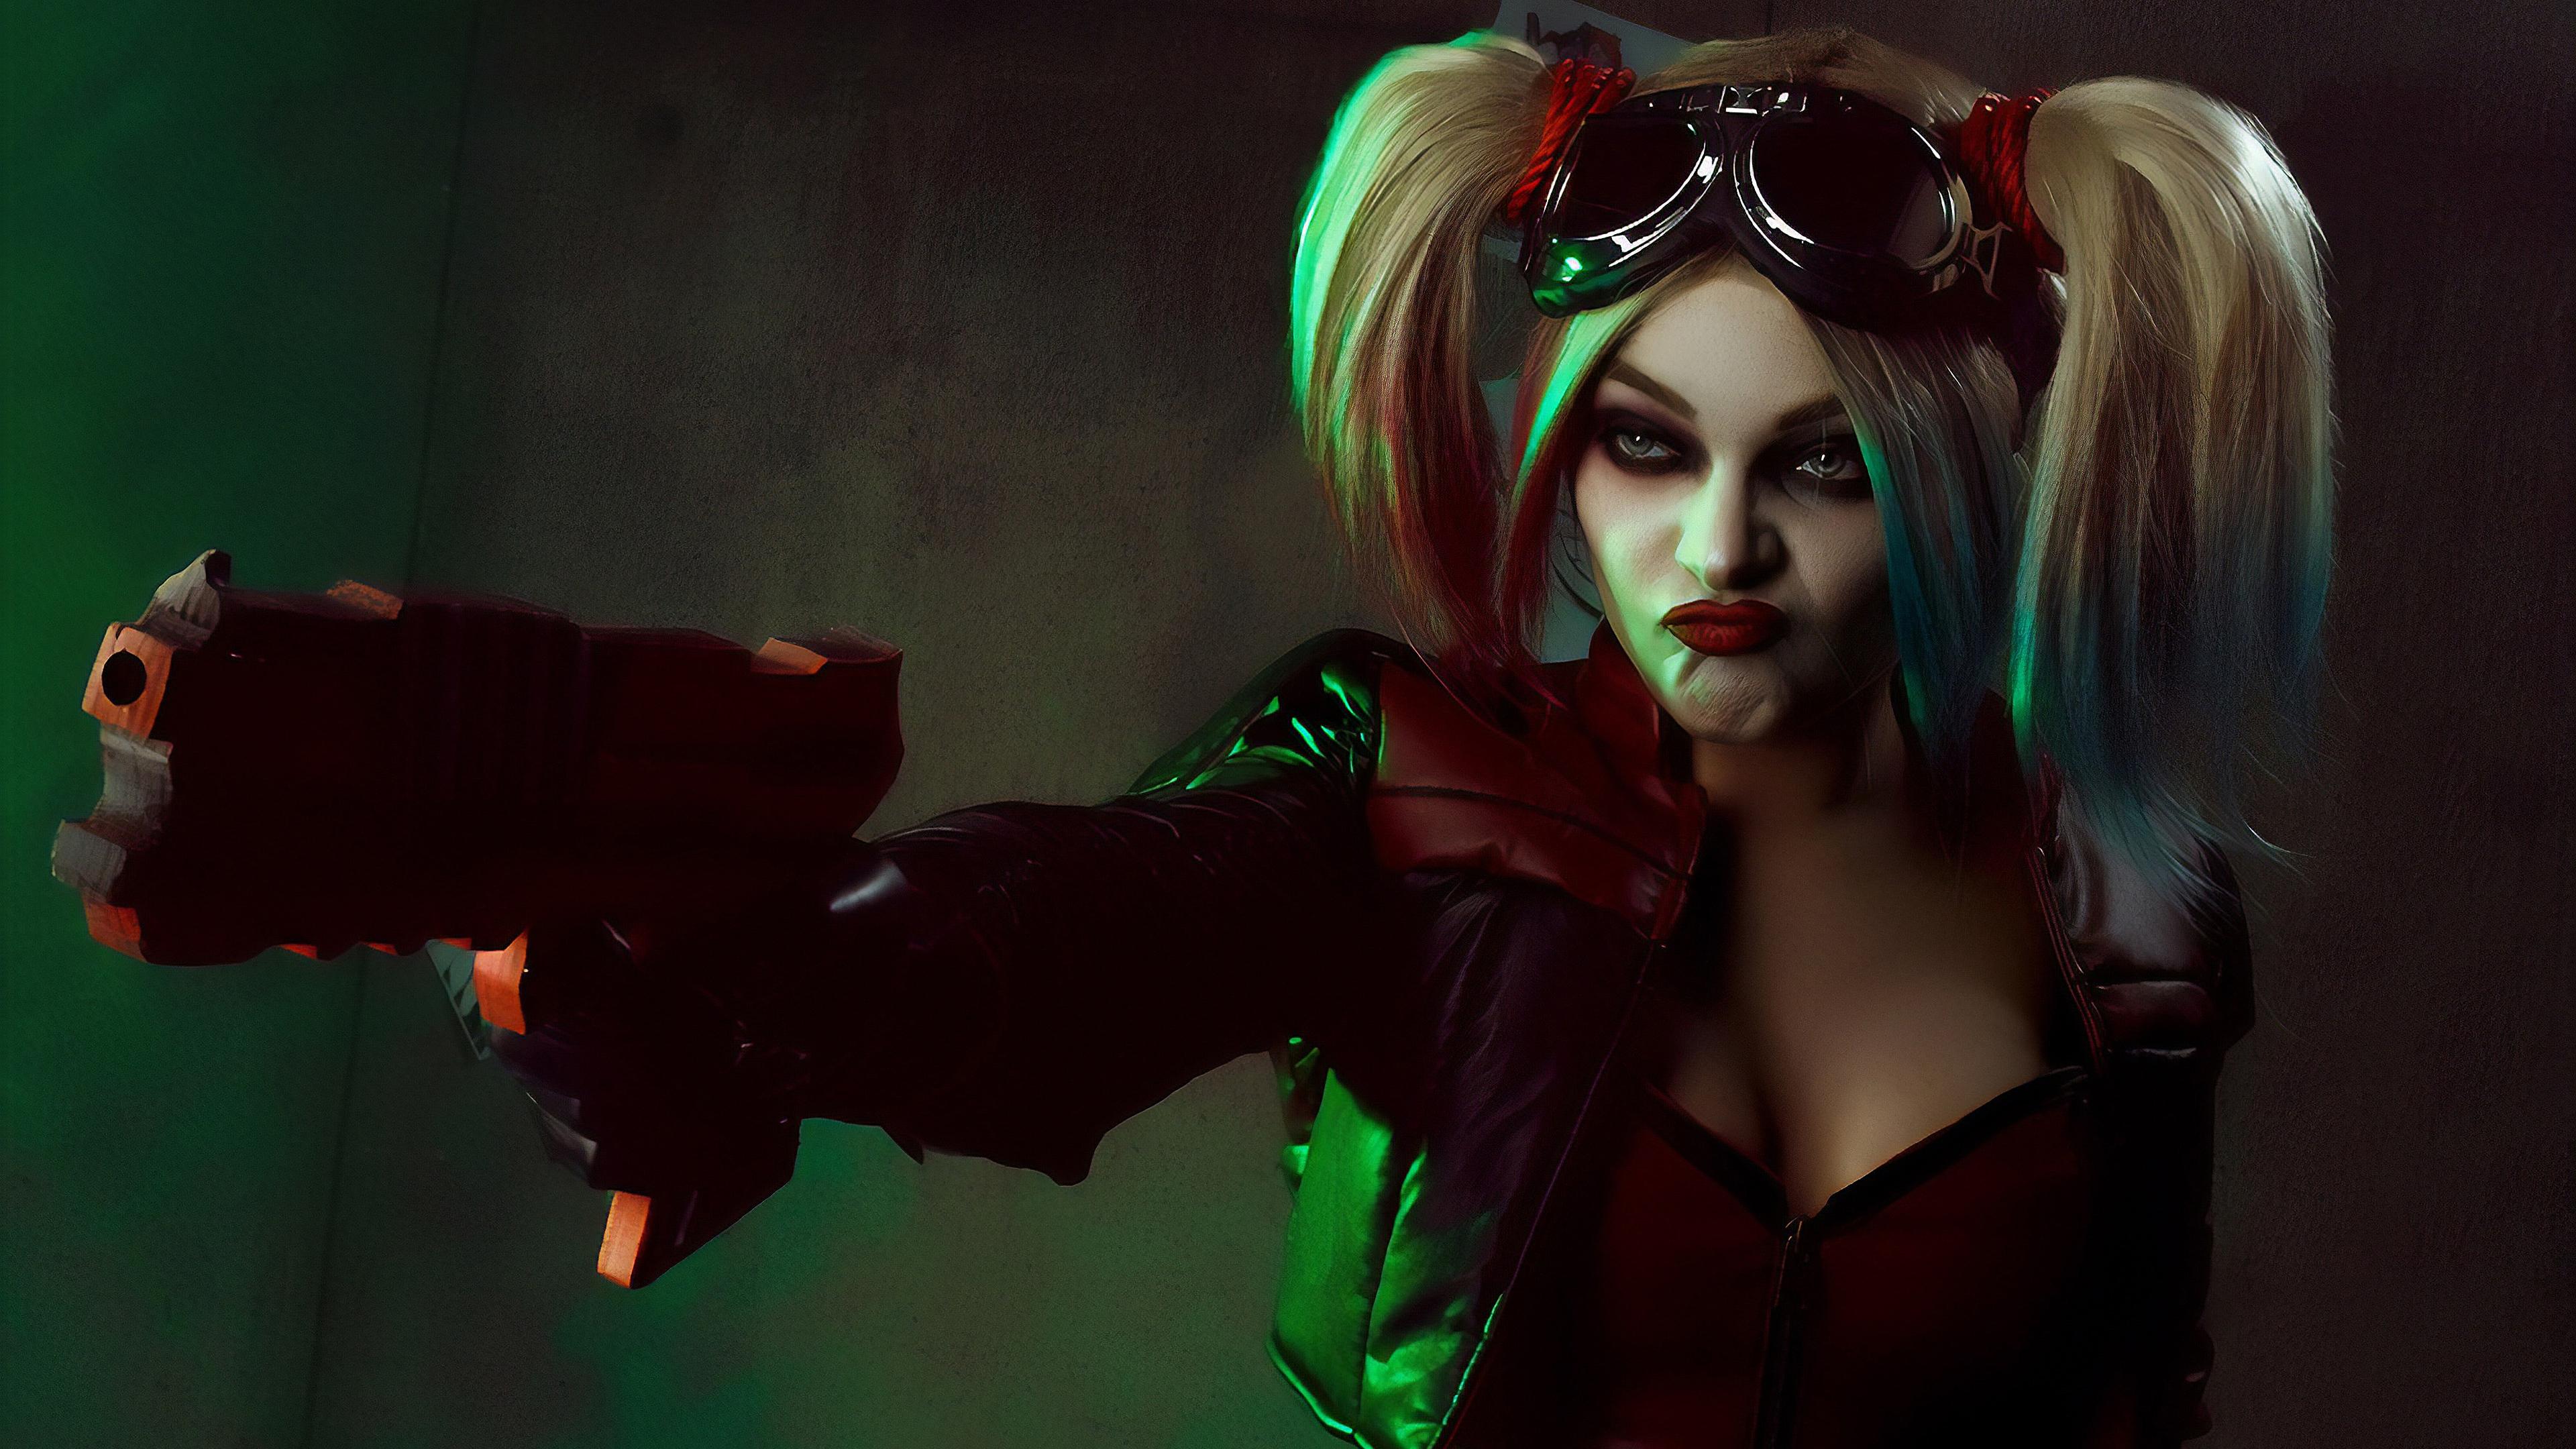 mad harley quinn cosplay 4k 1559764263 - Mad Harley Quinn Cosplay 4k - superheroes wallpapers, hd-wallpapers, harley quinn wallpapers, deviantart wallpapers, cosplay wallpapers, 4k-wallpapers